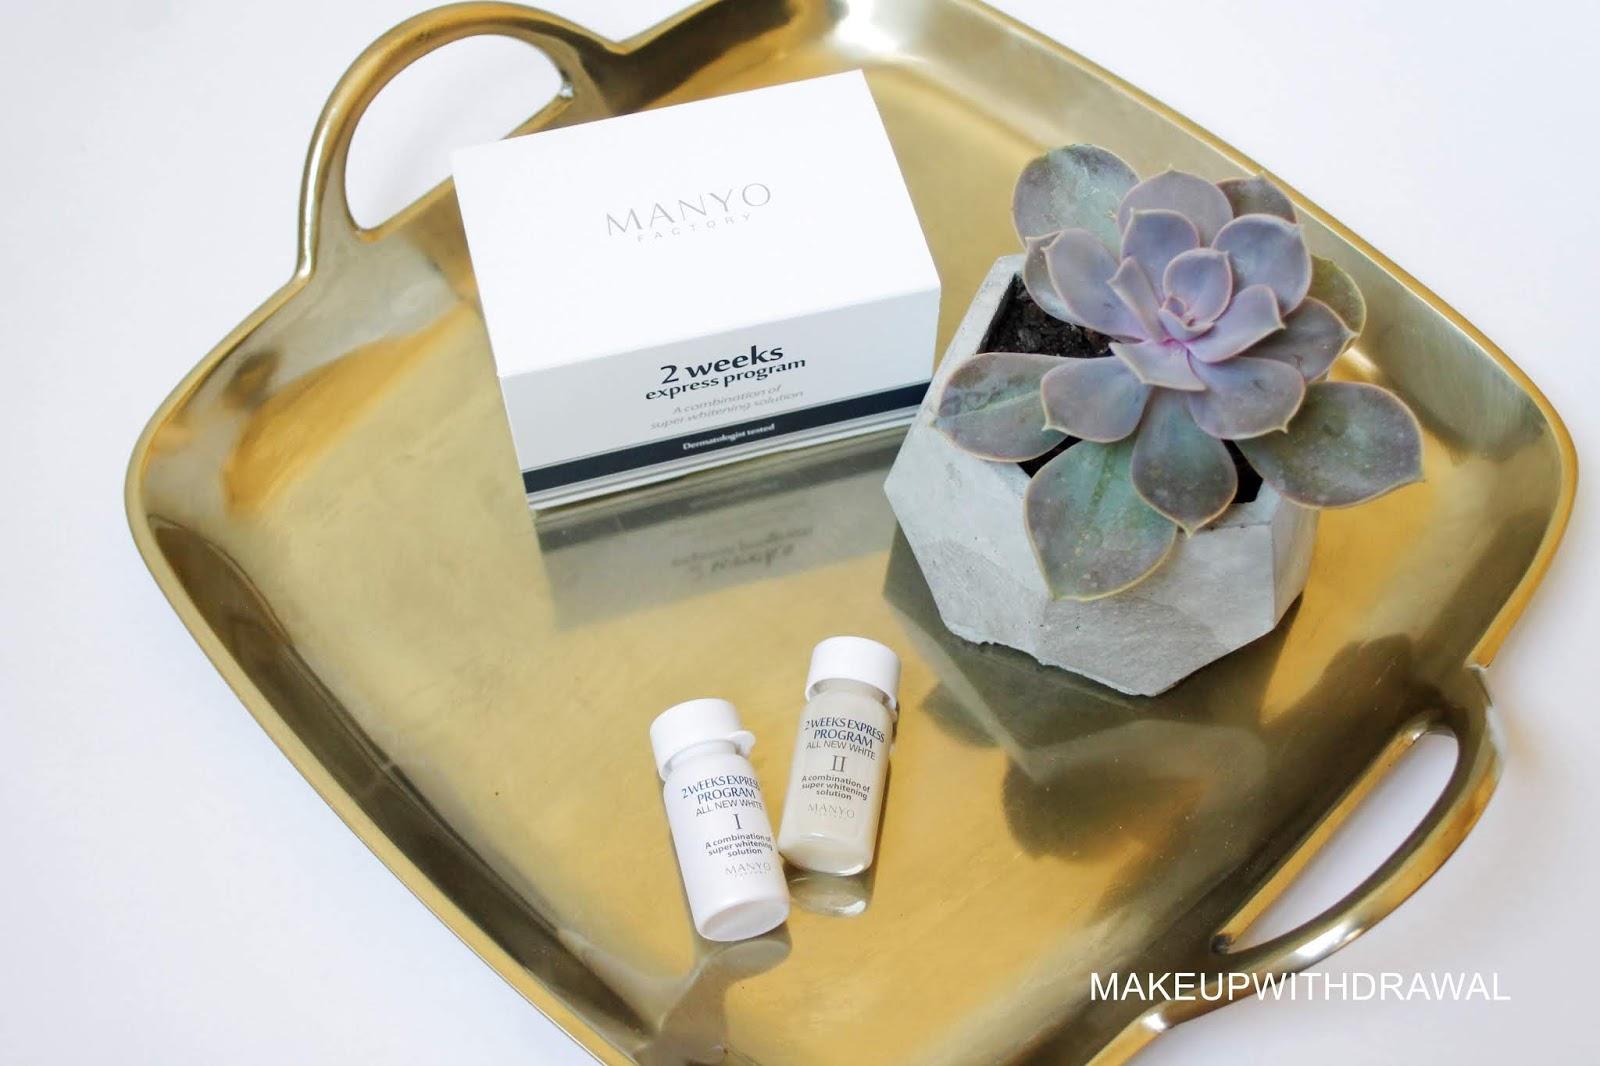 Manyo Factory 2 Week Express Program Makeup Withdrawal Bloglovin Pureheals Galactomyces 90 Ampoule 30ml